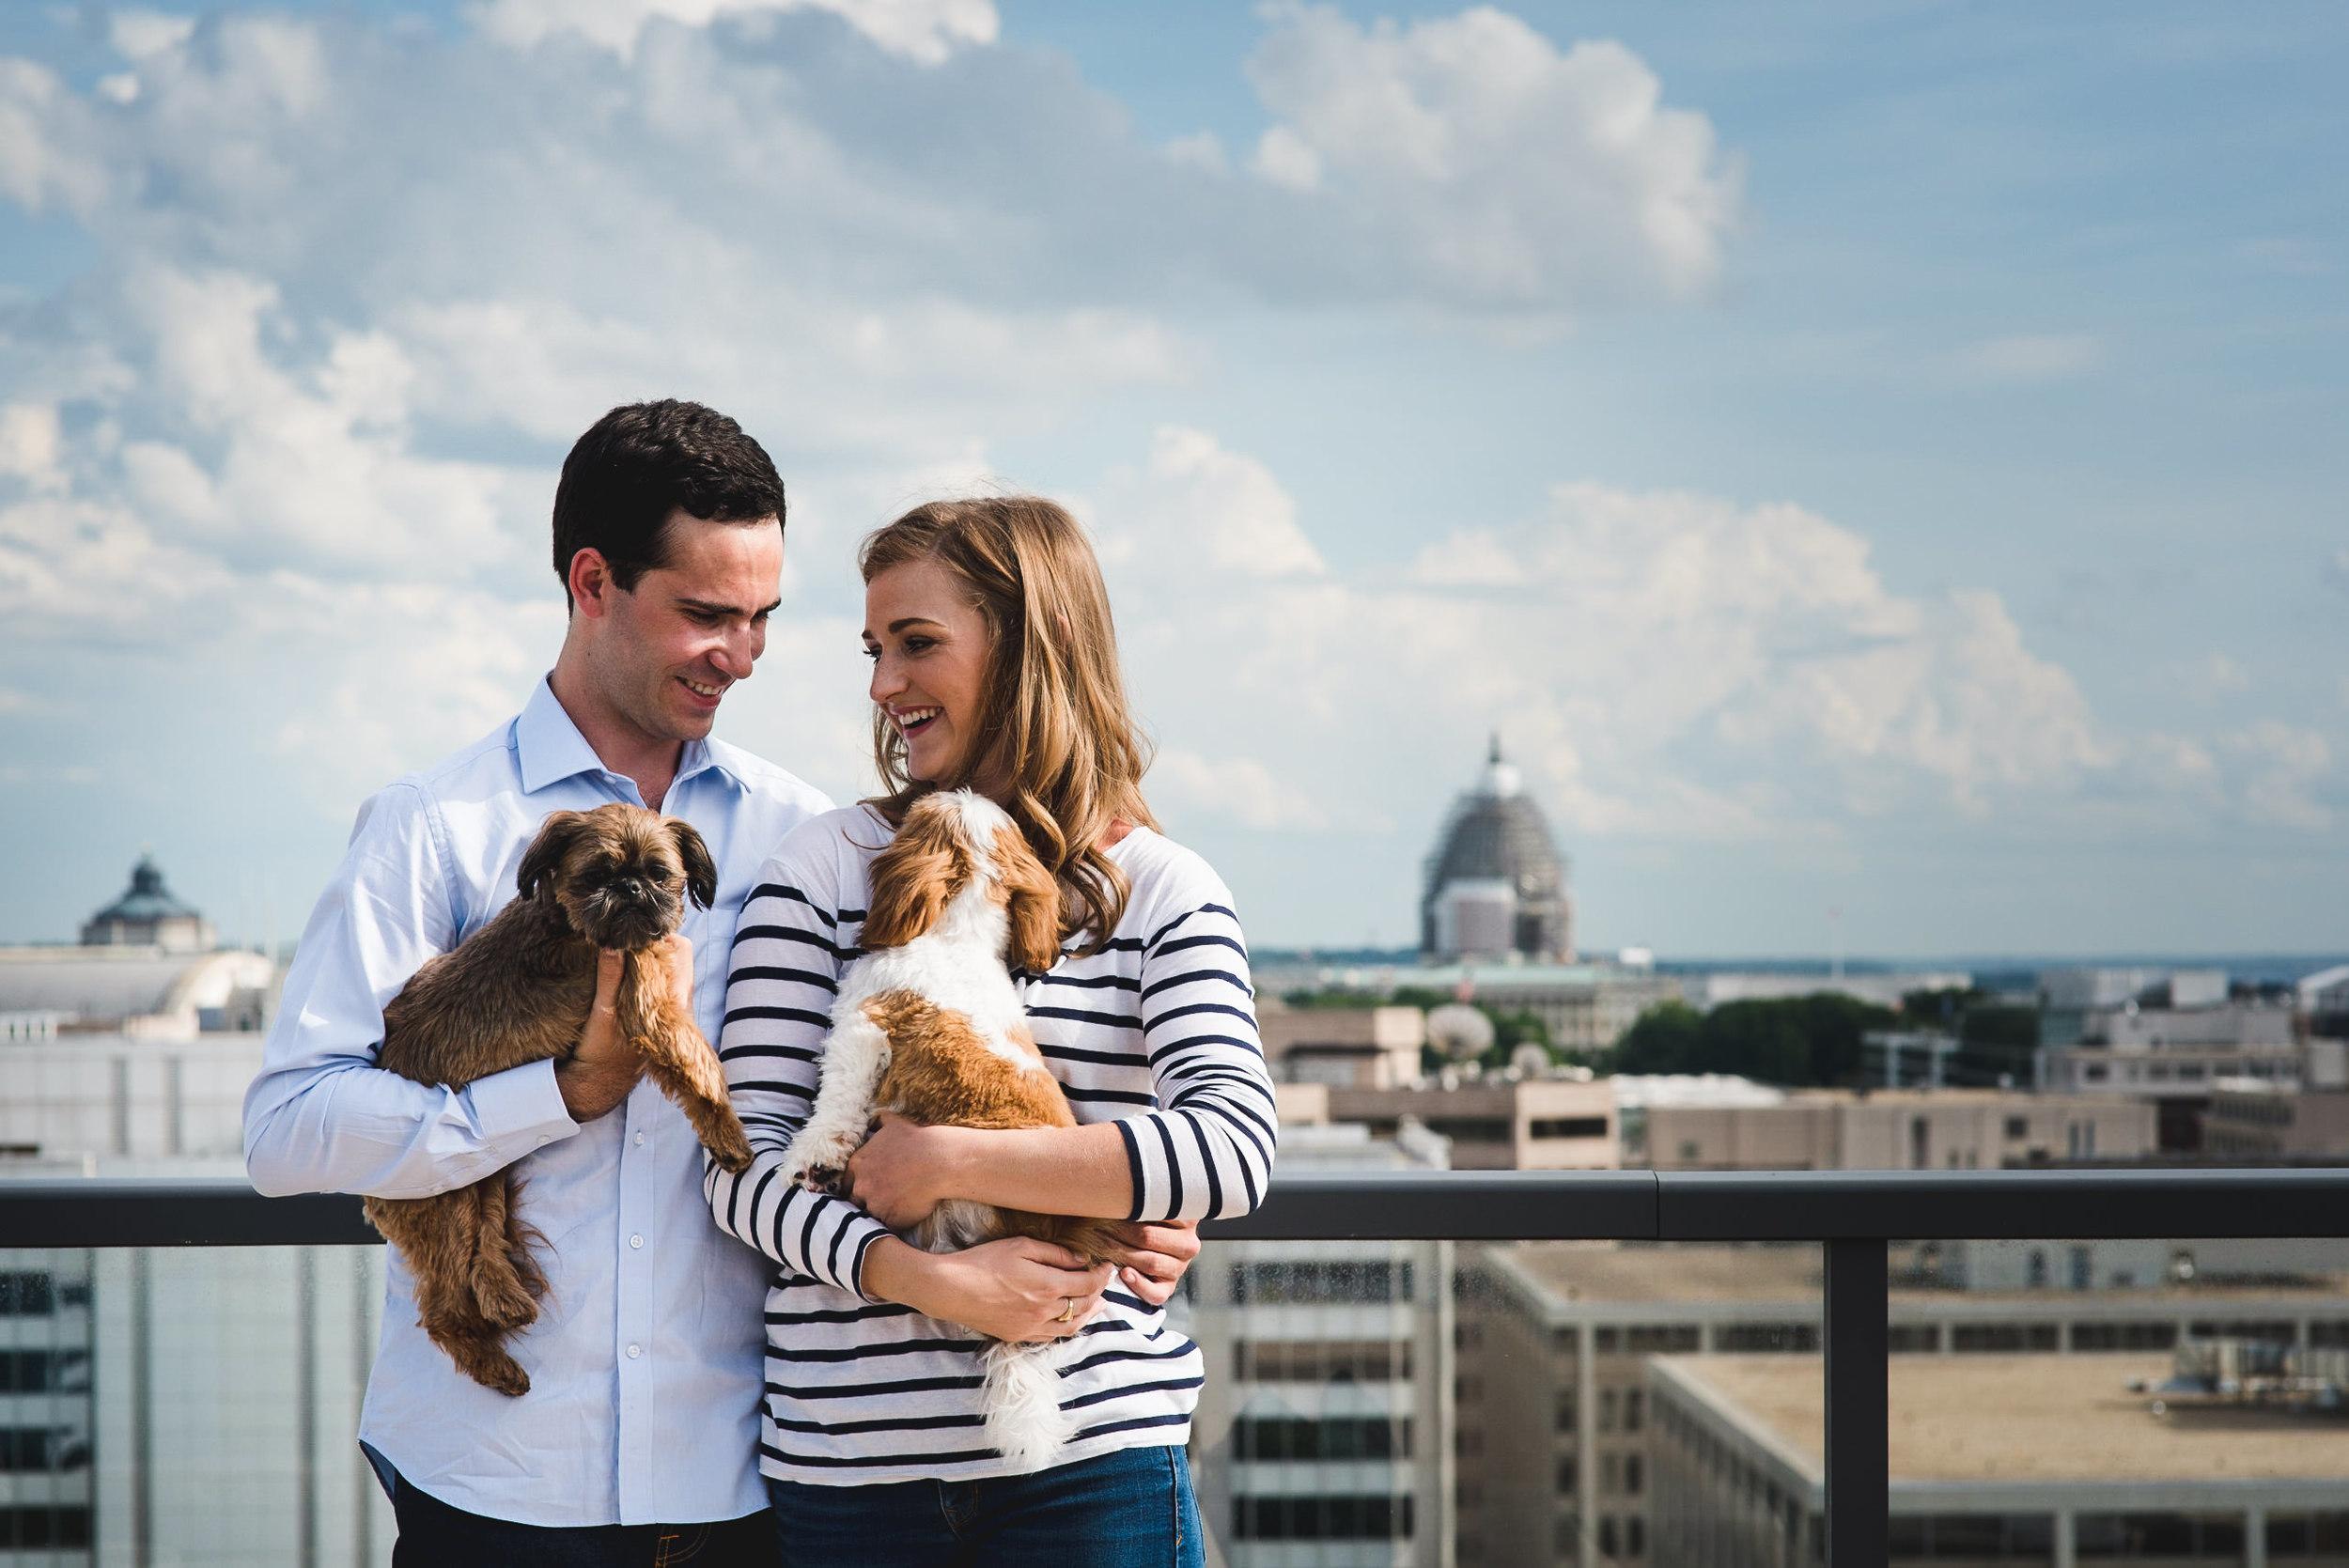 Best Washington DC Engagement Photographer Mantas Kubilinskas.jpg